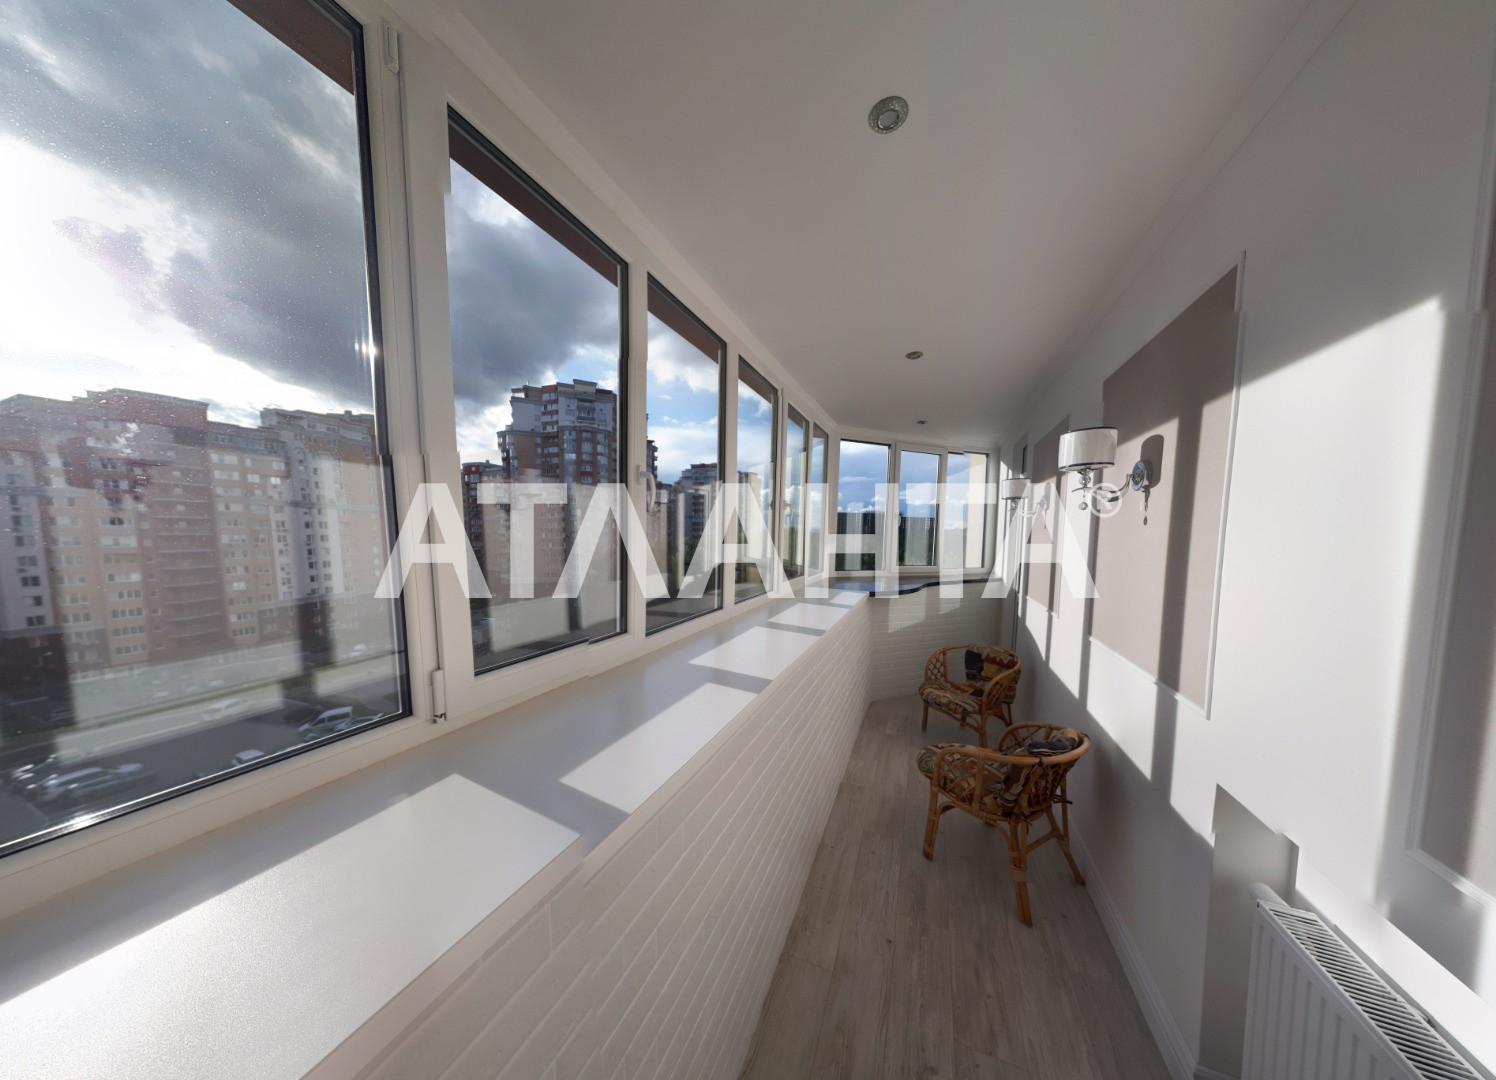 Продается 3-комнатная Квартира на ул. Ул. Ломоносова — 230 000 у.е. (фото №23)